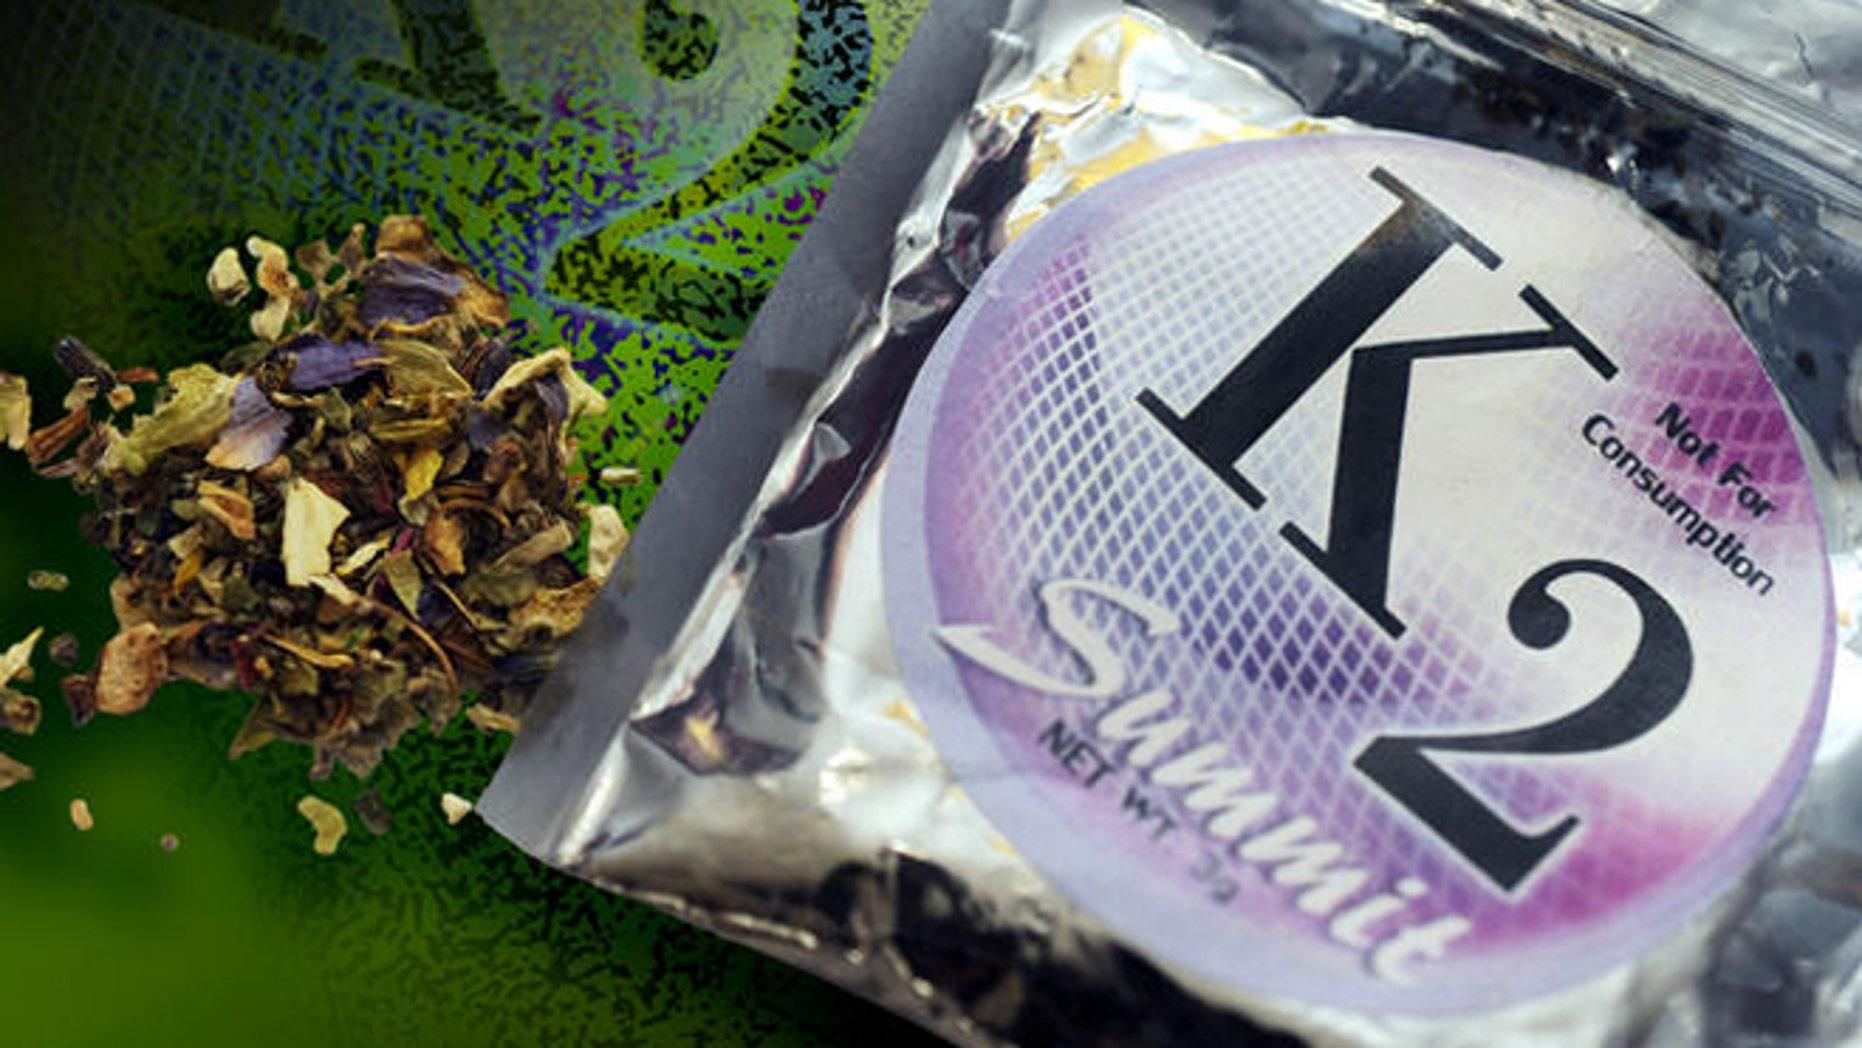 Synthetic marijuana' causes 11,000 ER visits annually | Fox News